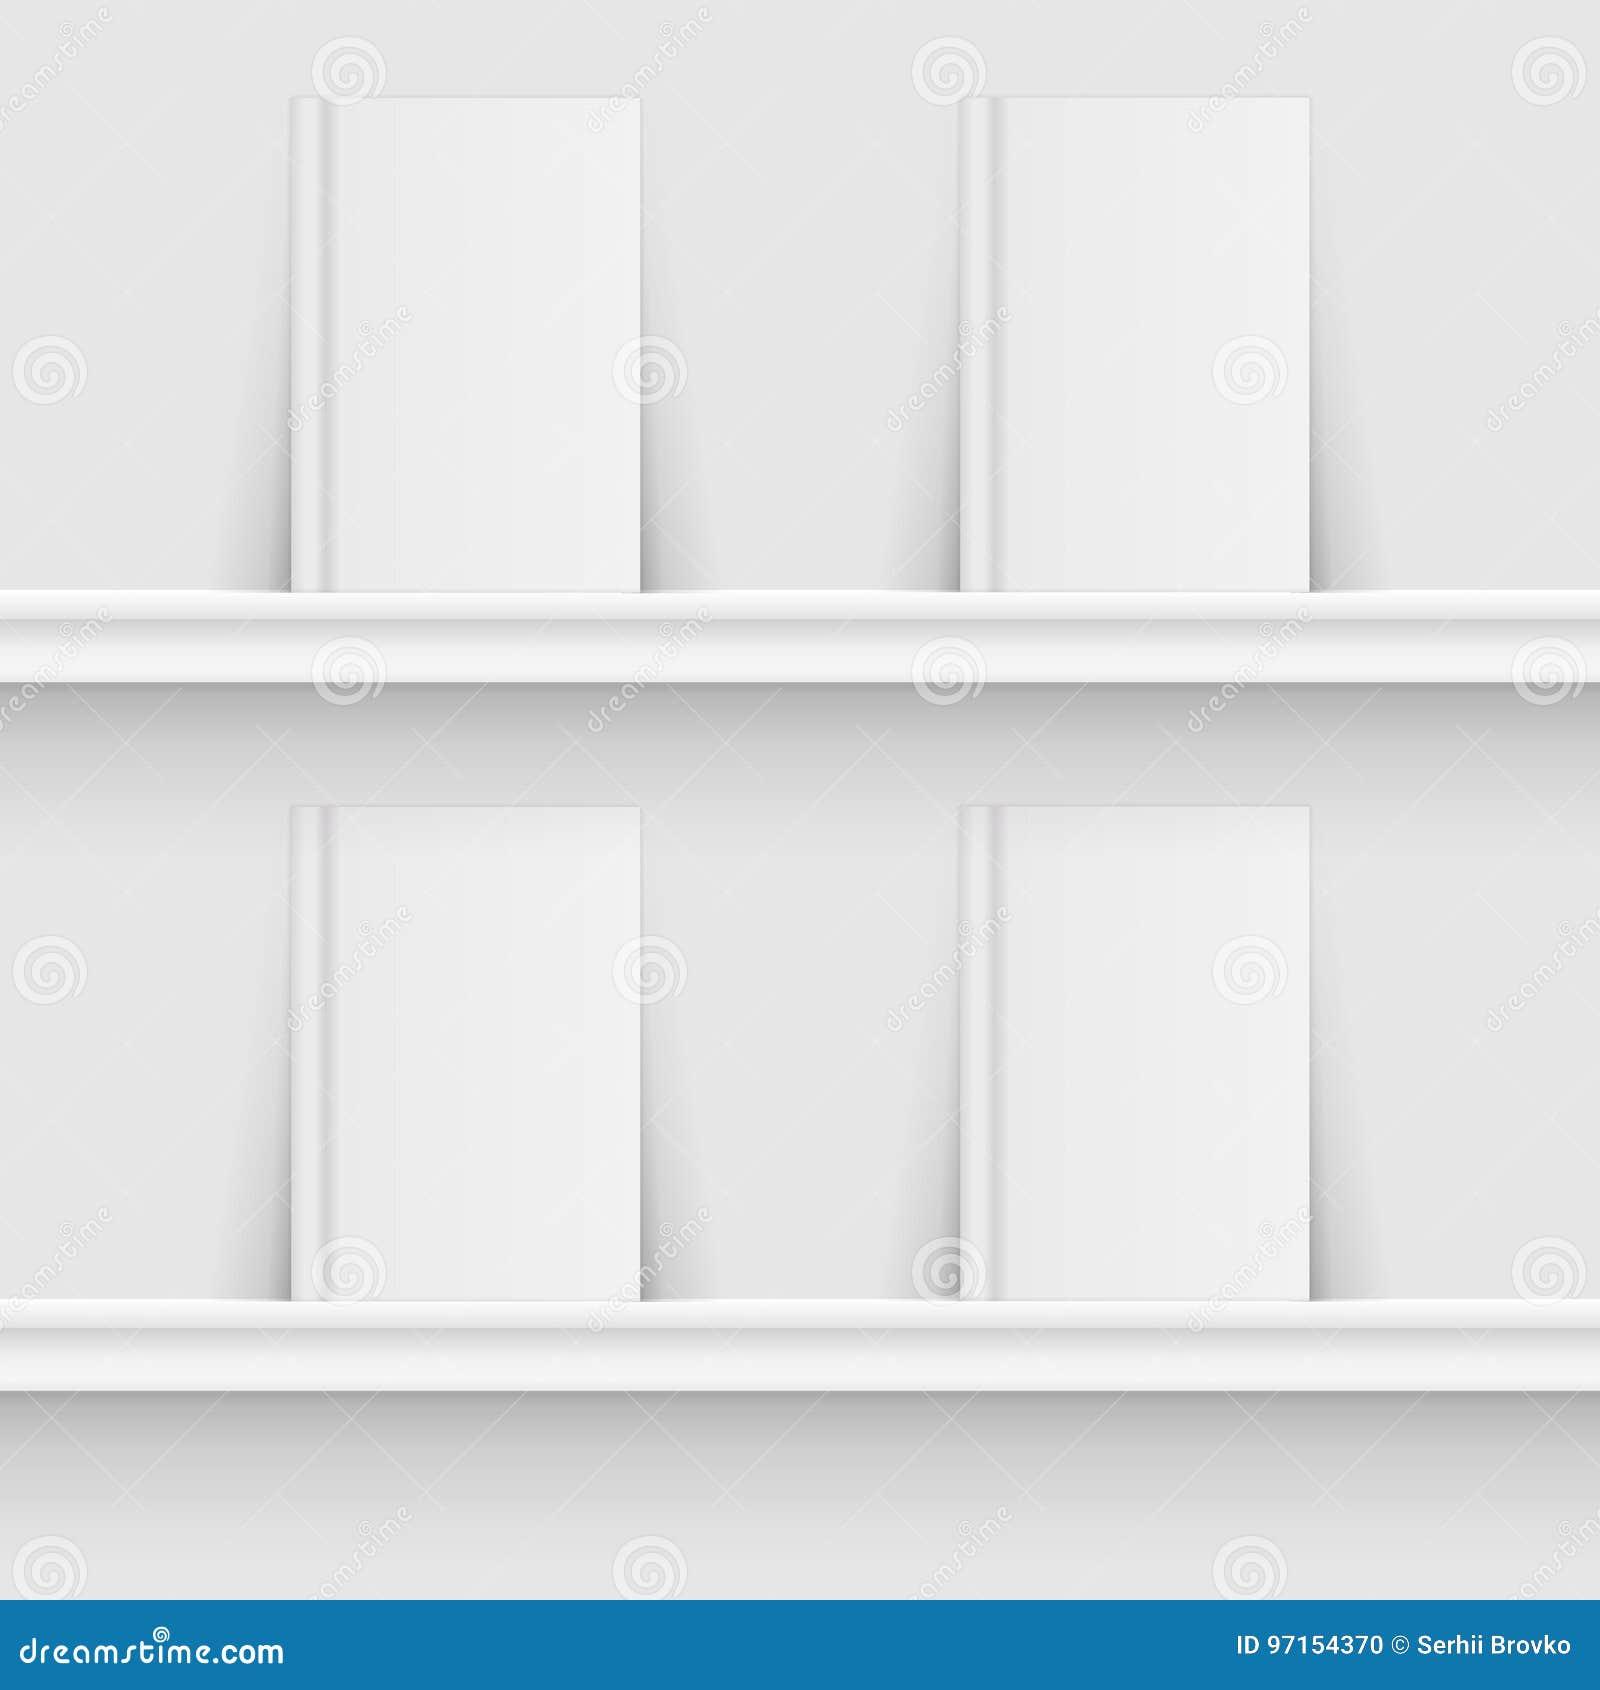 Blank book on book shelf. Hardcover Book Mock-Up grey background. Vector illustration.